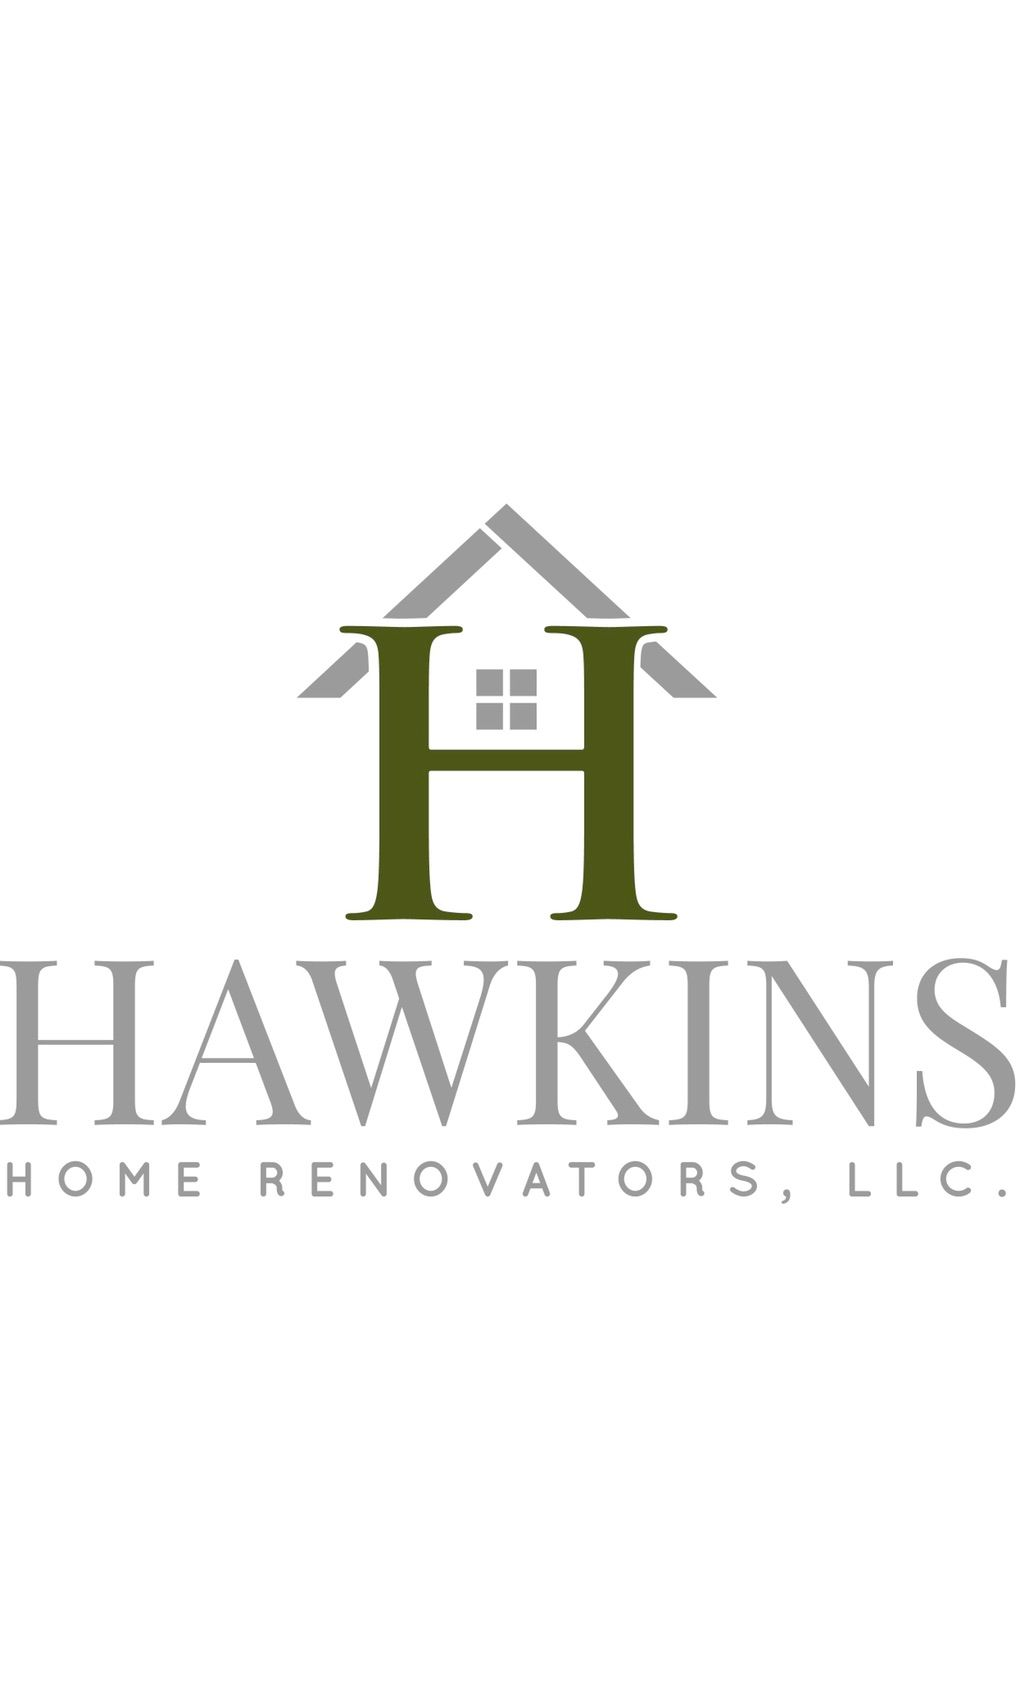 Hawkins Home Renovators